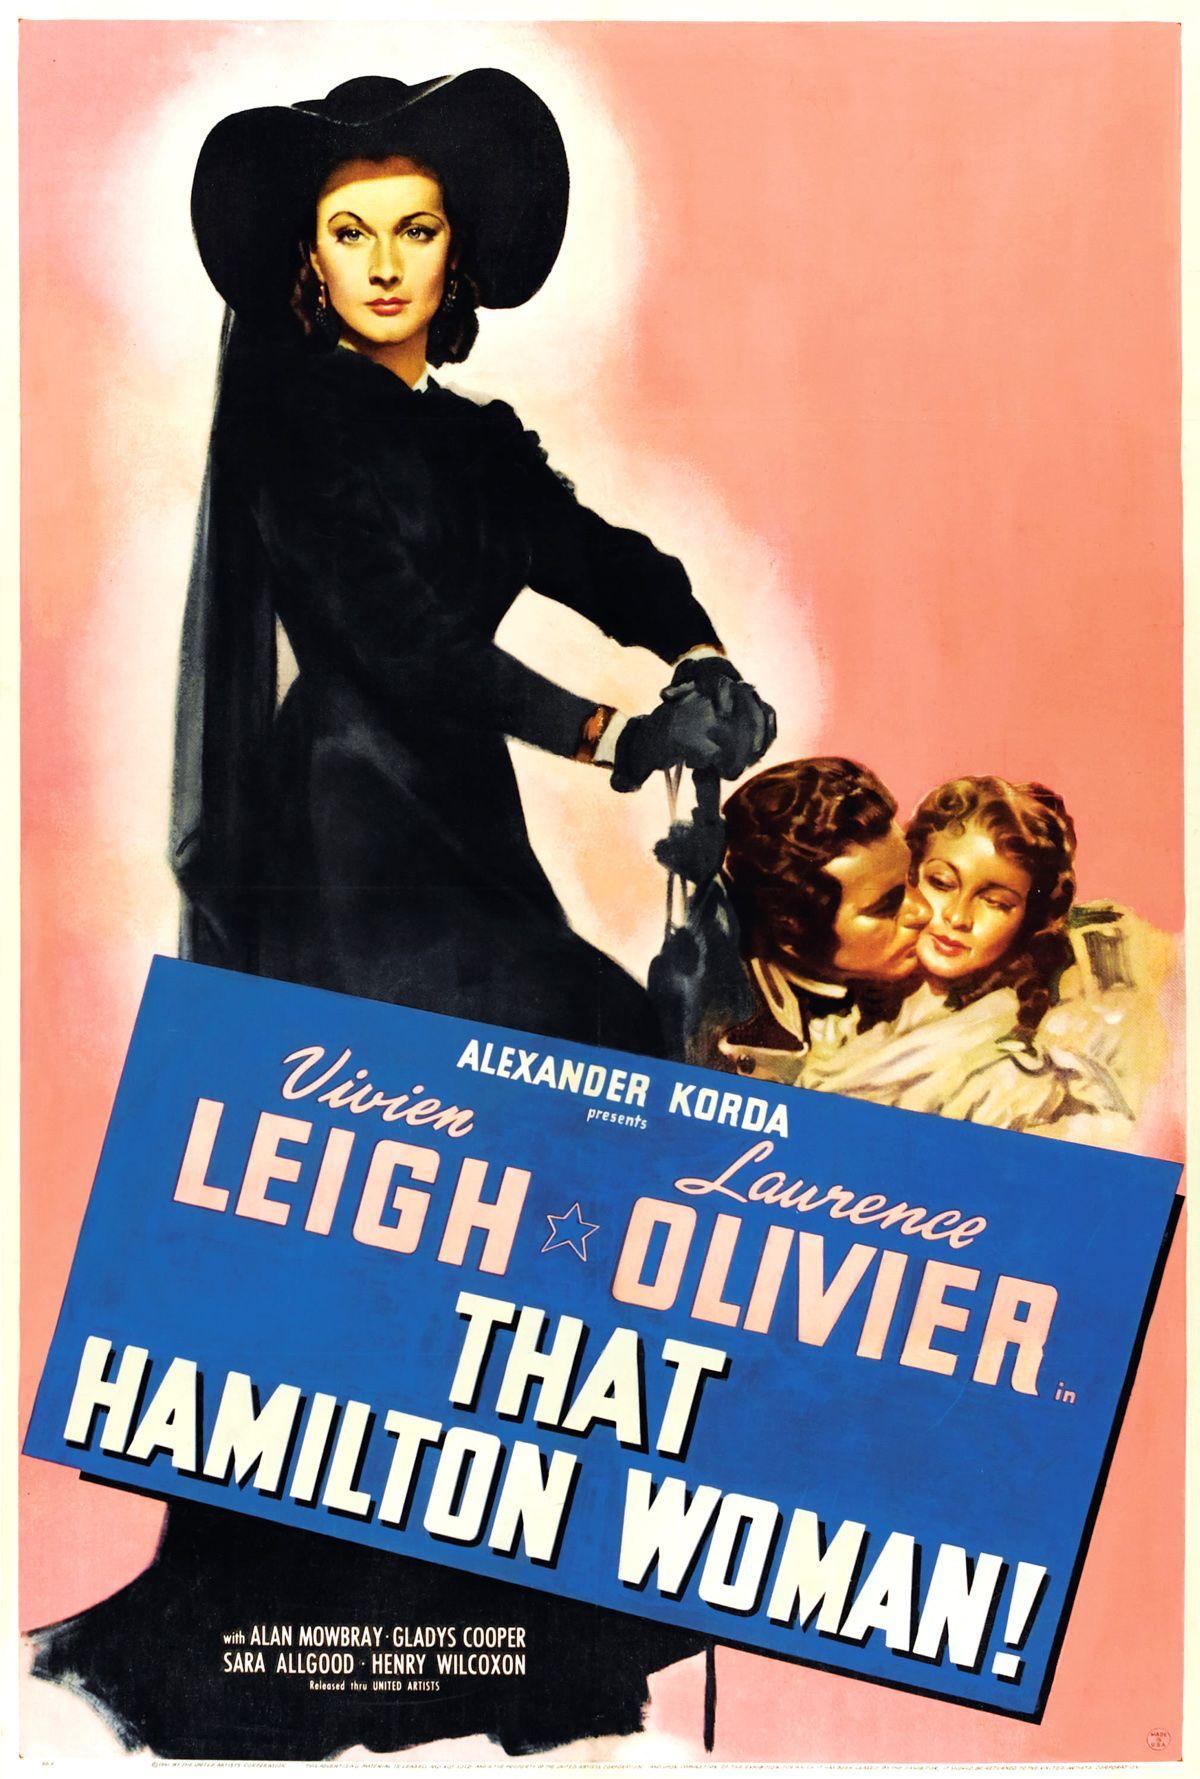 Vivian Leigh, Laurence Olivier, Alan Mowbray. Director: Alexander Korda.. IMDB: 7.4 _____________________ https://en.wikipedia.org/wiki/That_Hamilton_Woman http://www.rottentomatoes.com/m/that_hamilton_woman/ http://www.tcm.com/tcmdb/title/92696/That-Hamilton-Woman/ Article: http://www.tcm.com/tcmdb/title/92696/That-Hamilton-Woman/articles.html http://www.allmovie.com/movie/that-hamilton-woman-v49262 http://www.afi.com/members/catalog/DetailView.aspx?s=&Movie=27591